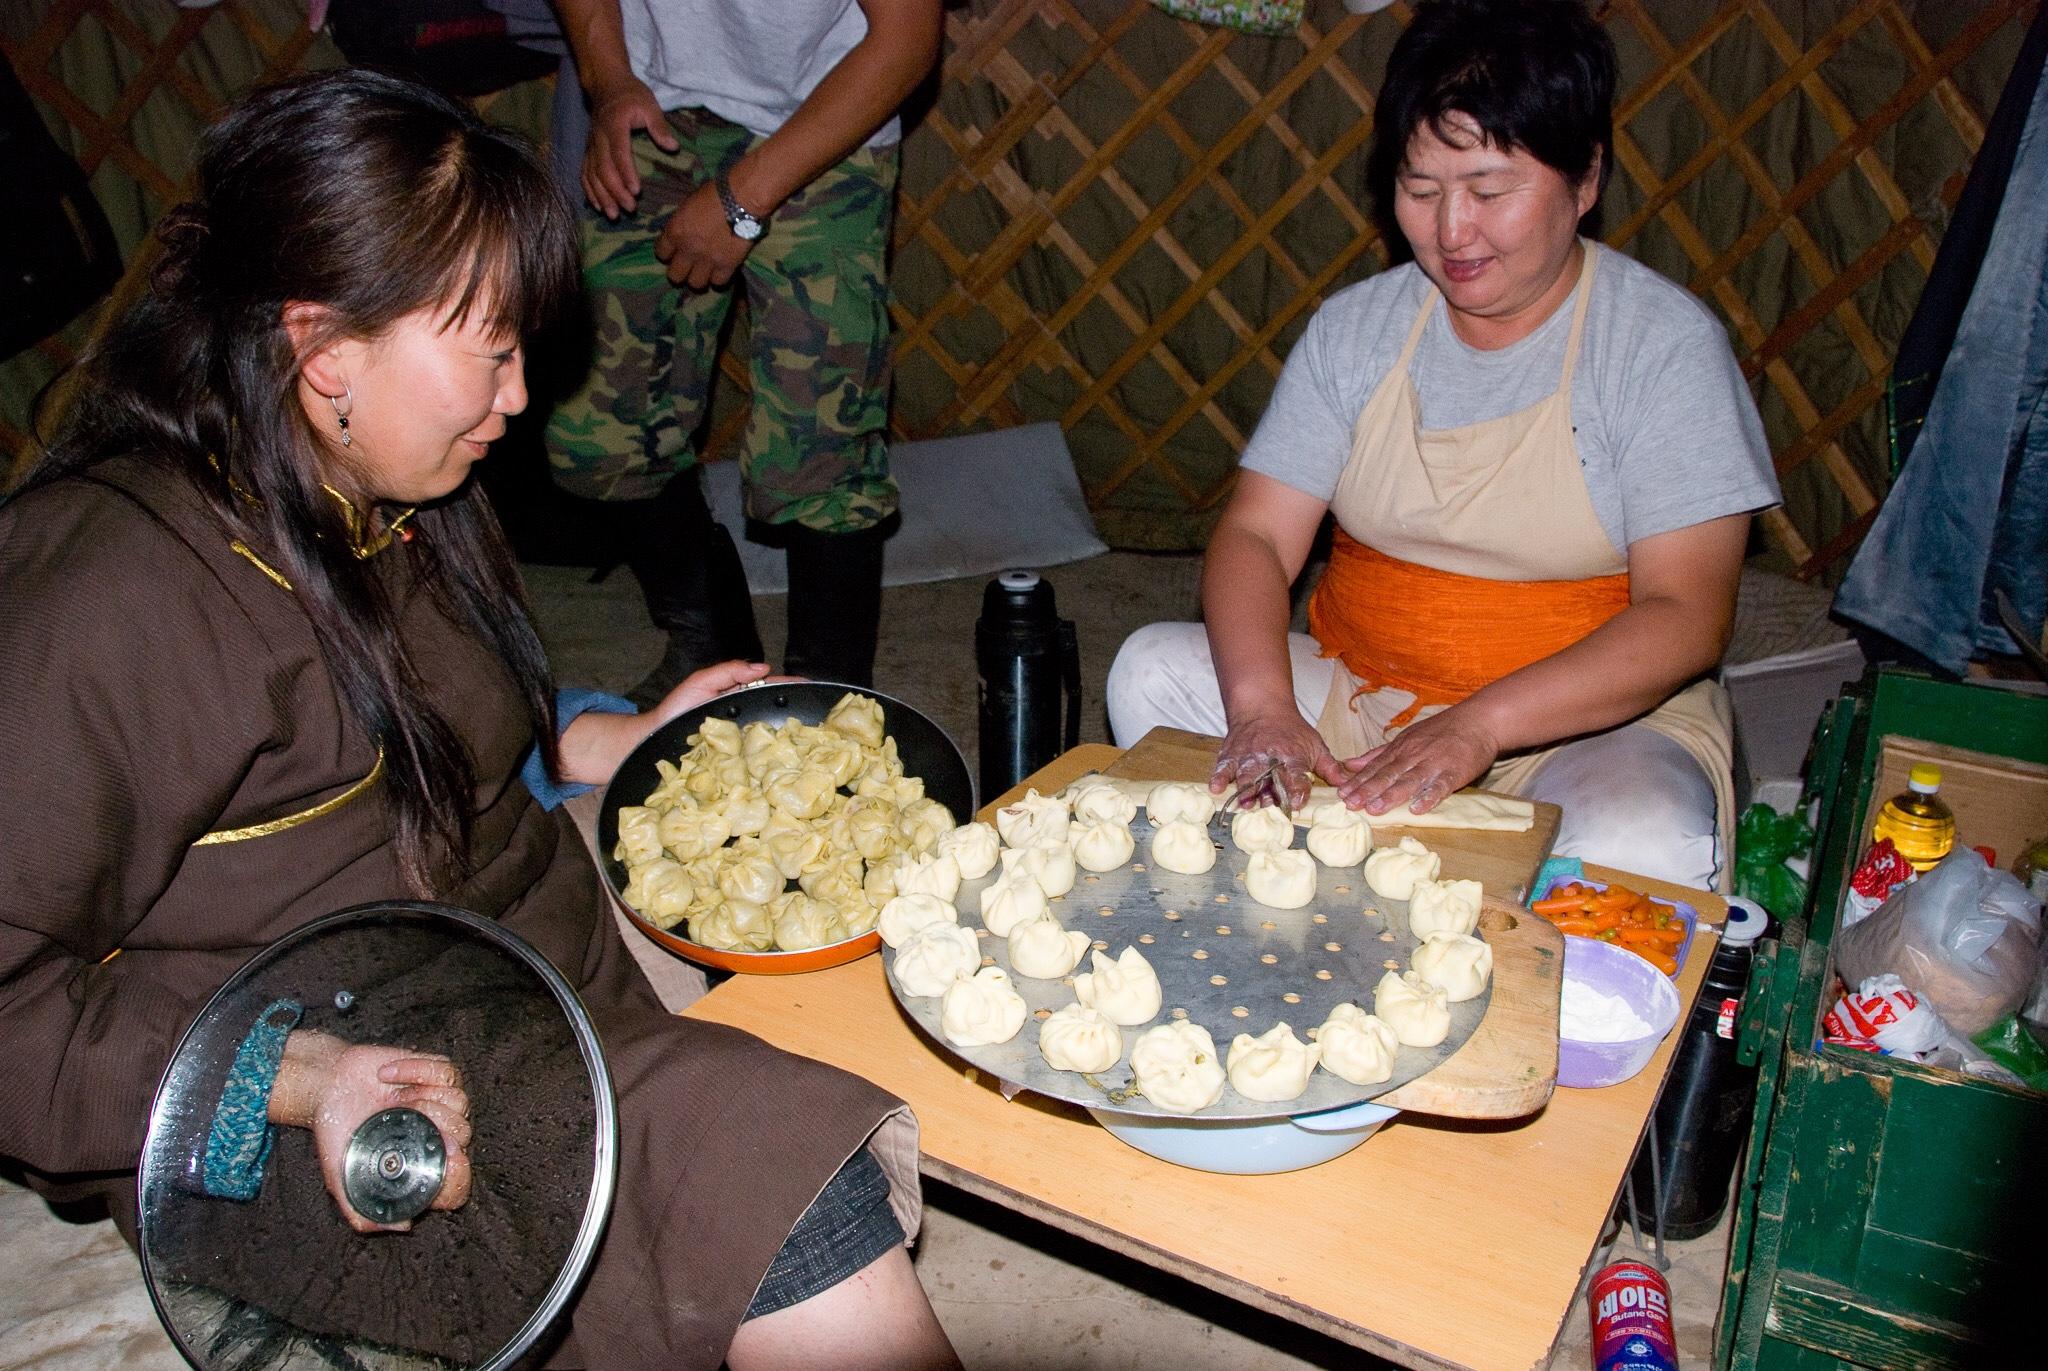 Near Gobi, Mongolia, 2007